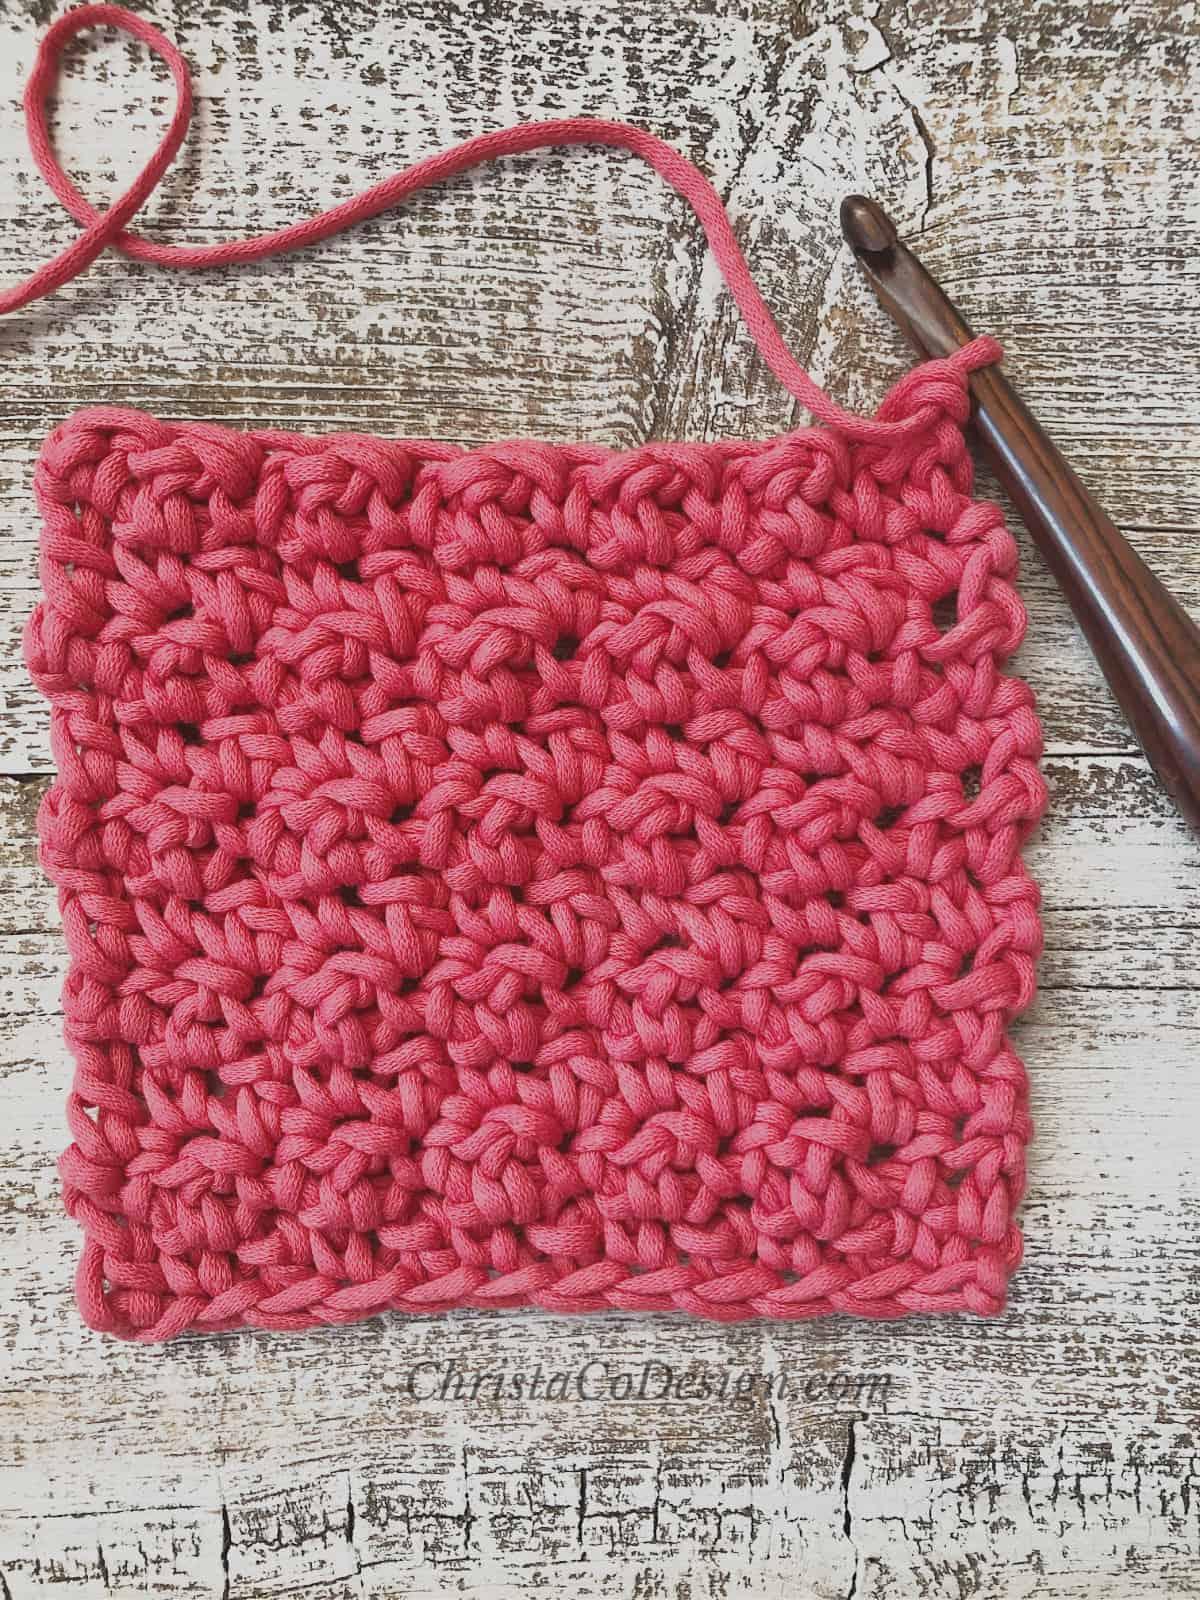 picture of red lemon peel square on hook lemon peel stitch tutorial